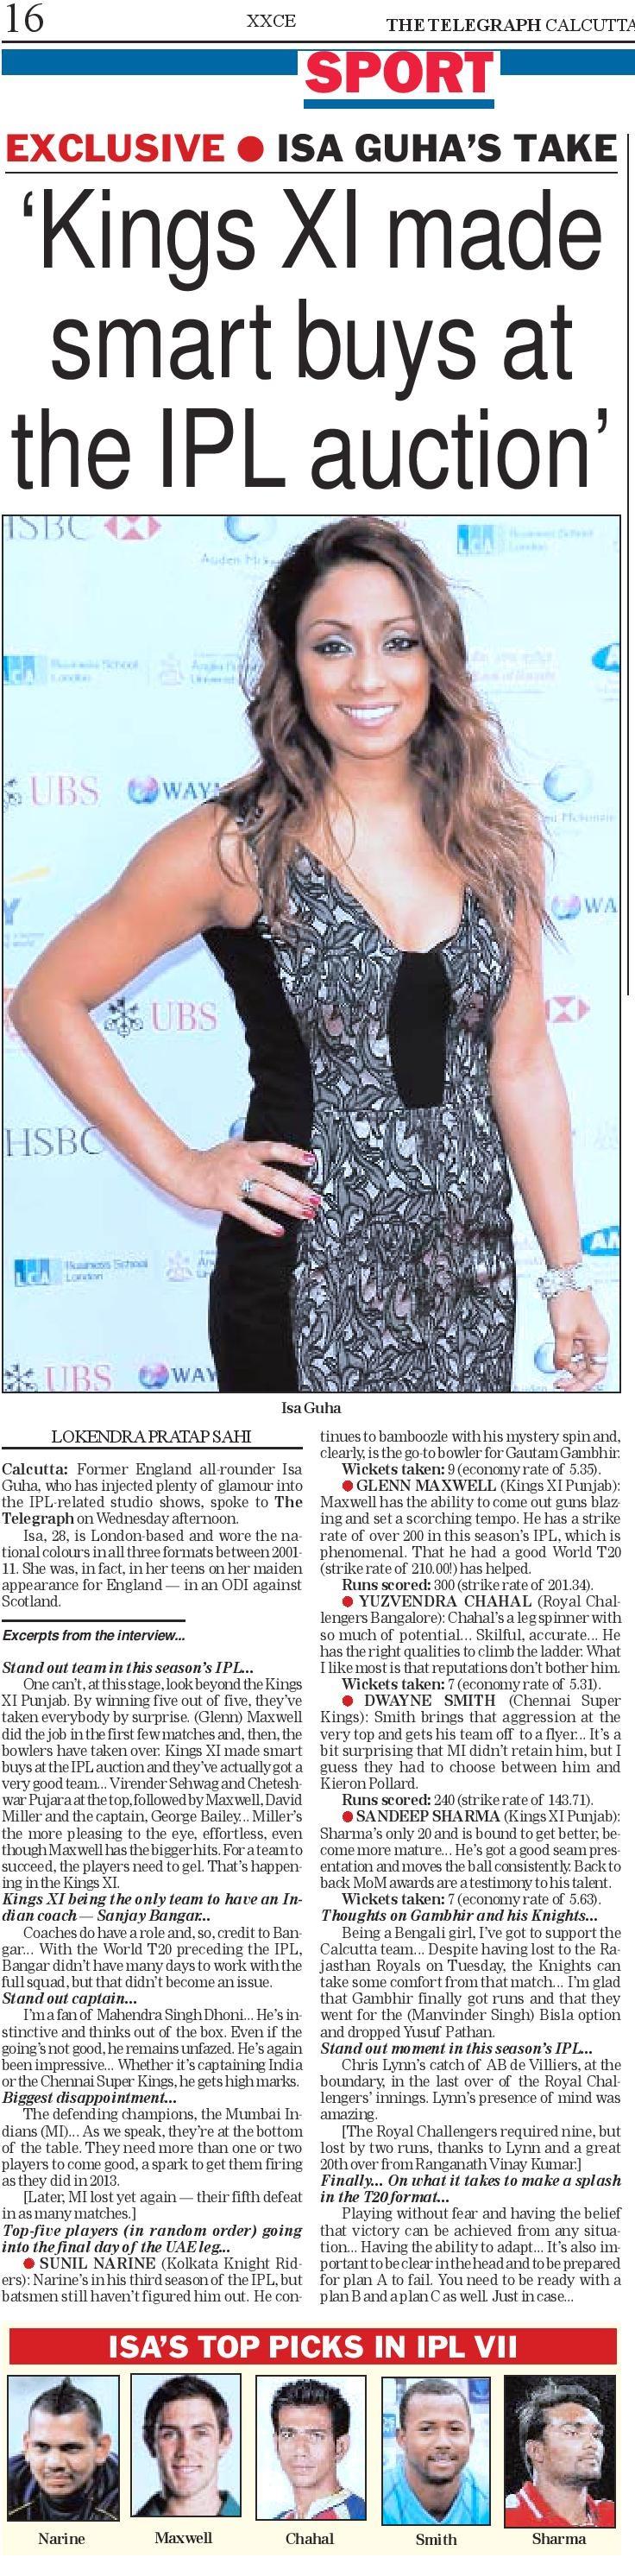 The Telegraph Calcutta - Isa Guha-page-001.jpg